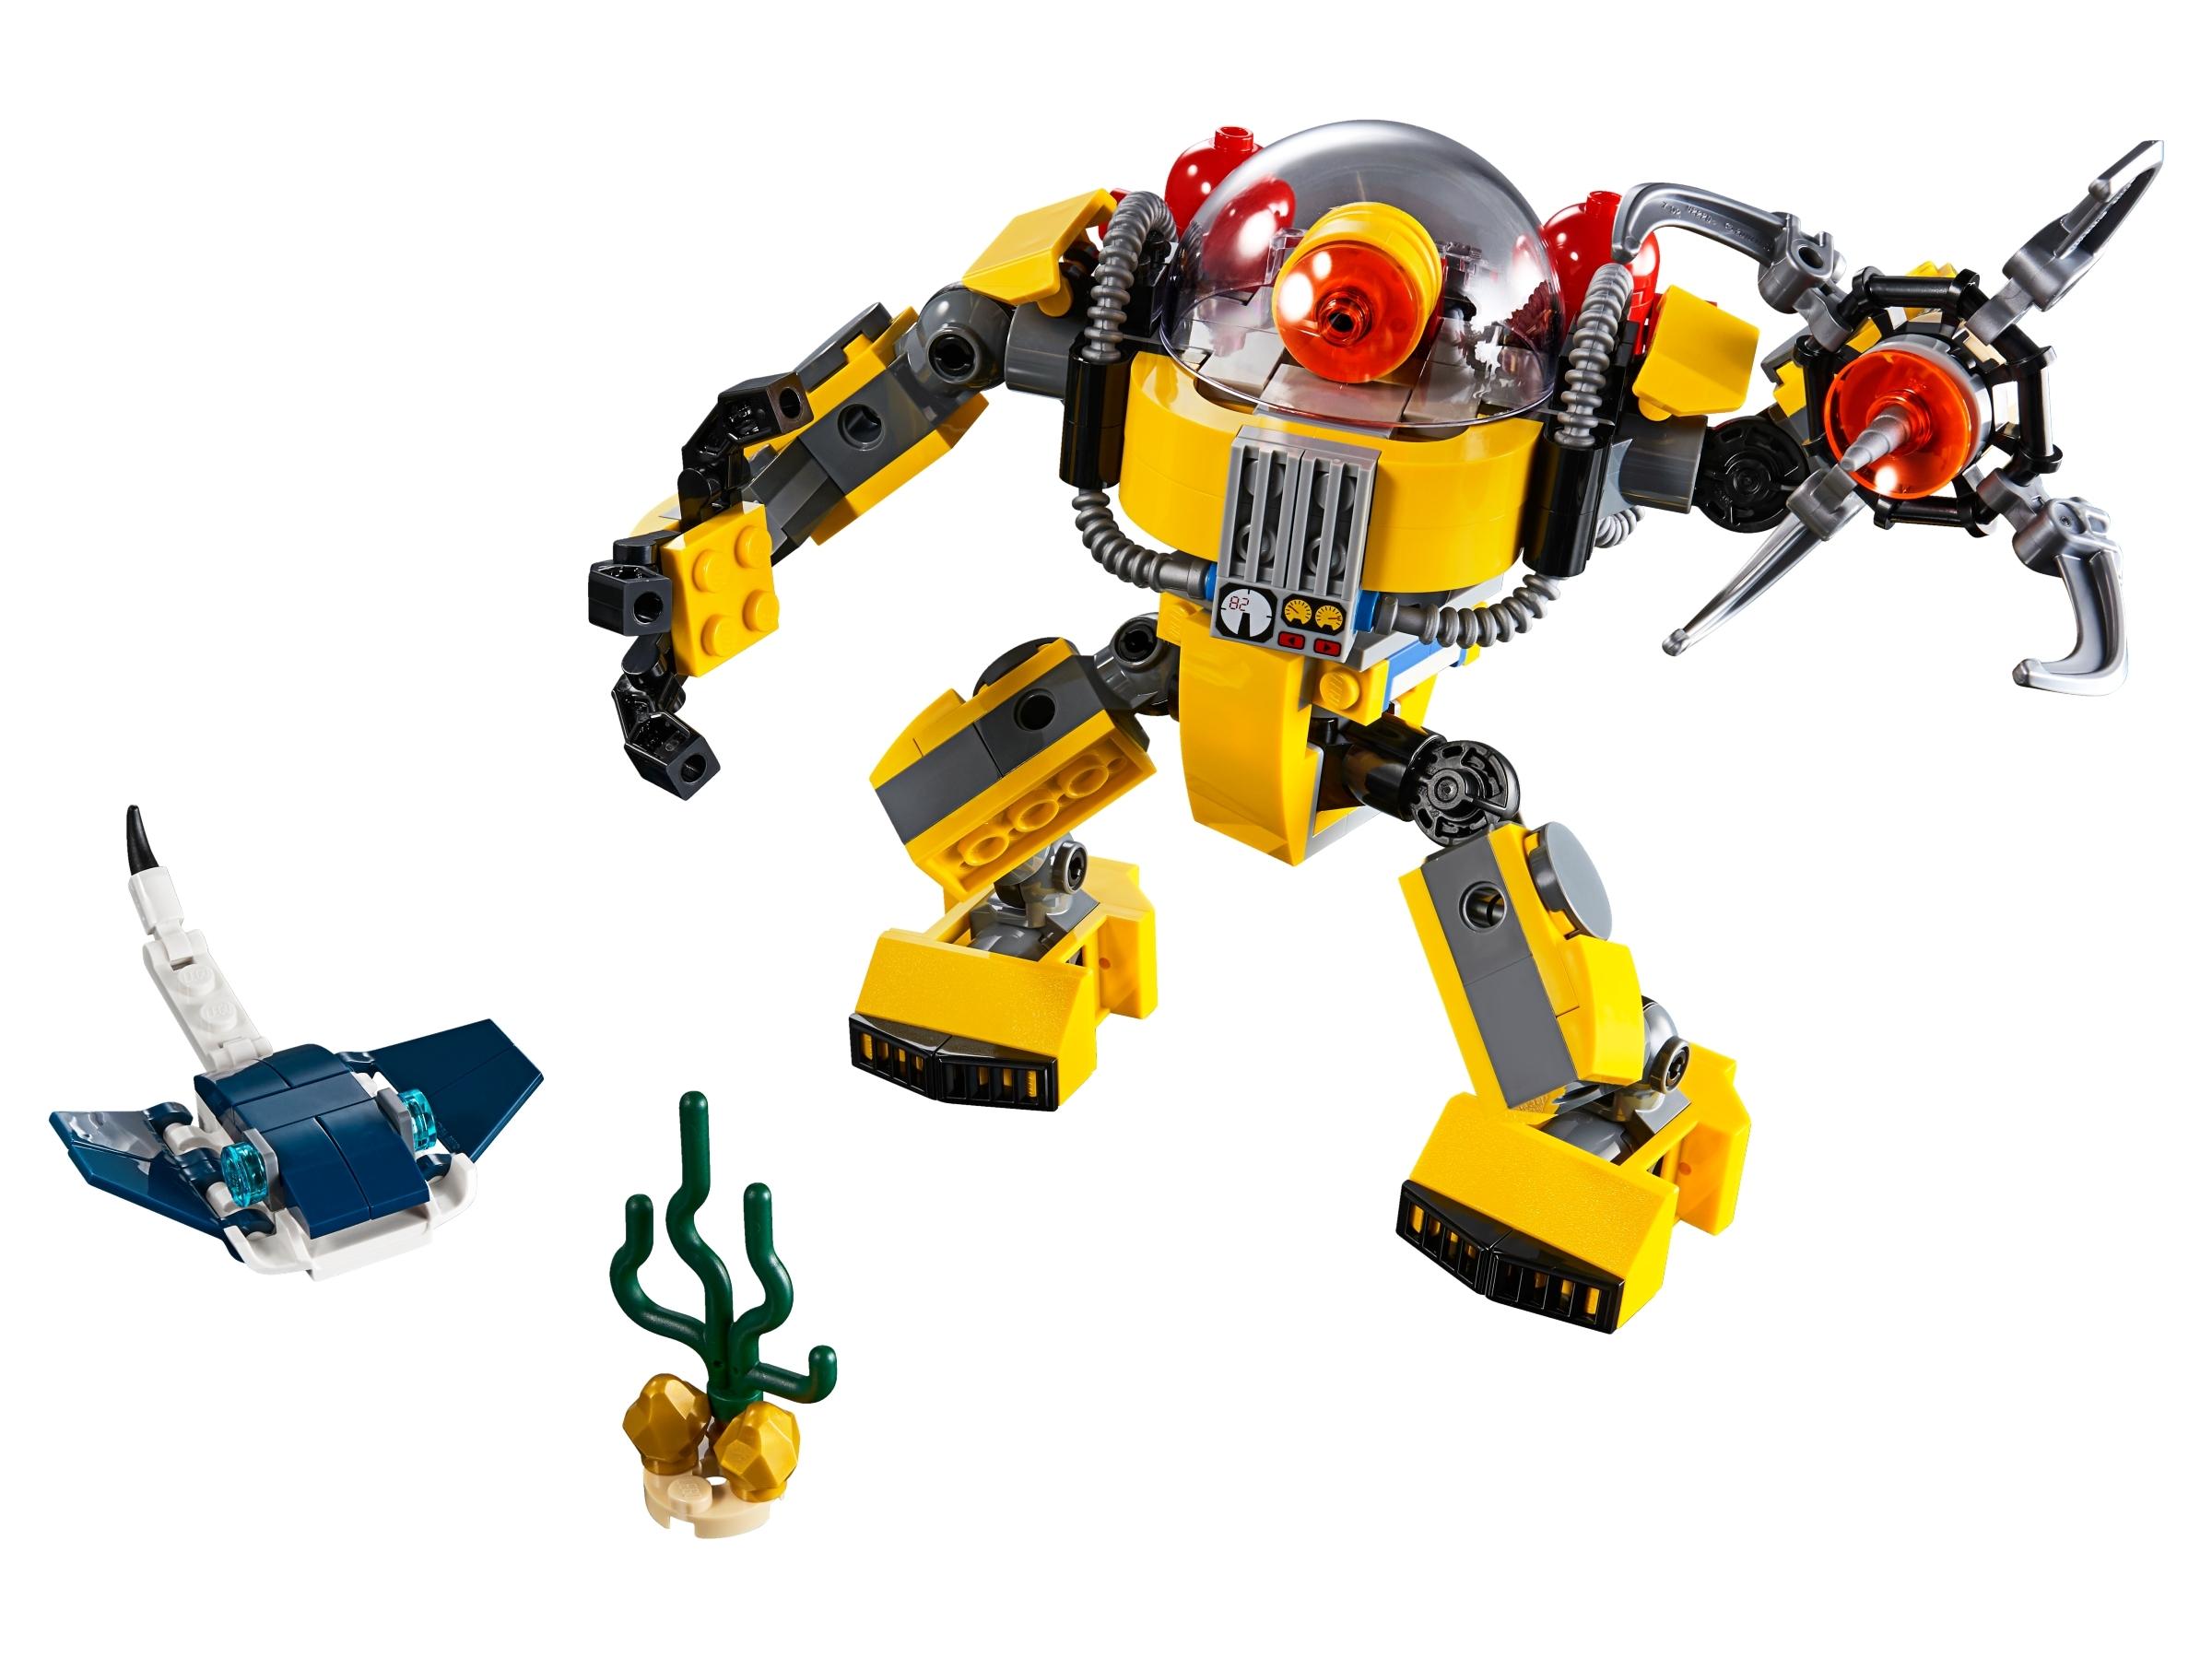 LEGO Creator 3-in-1 31090 Undervattensrobot